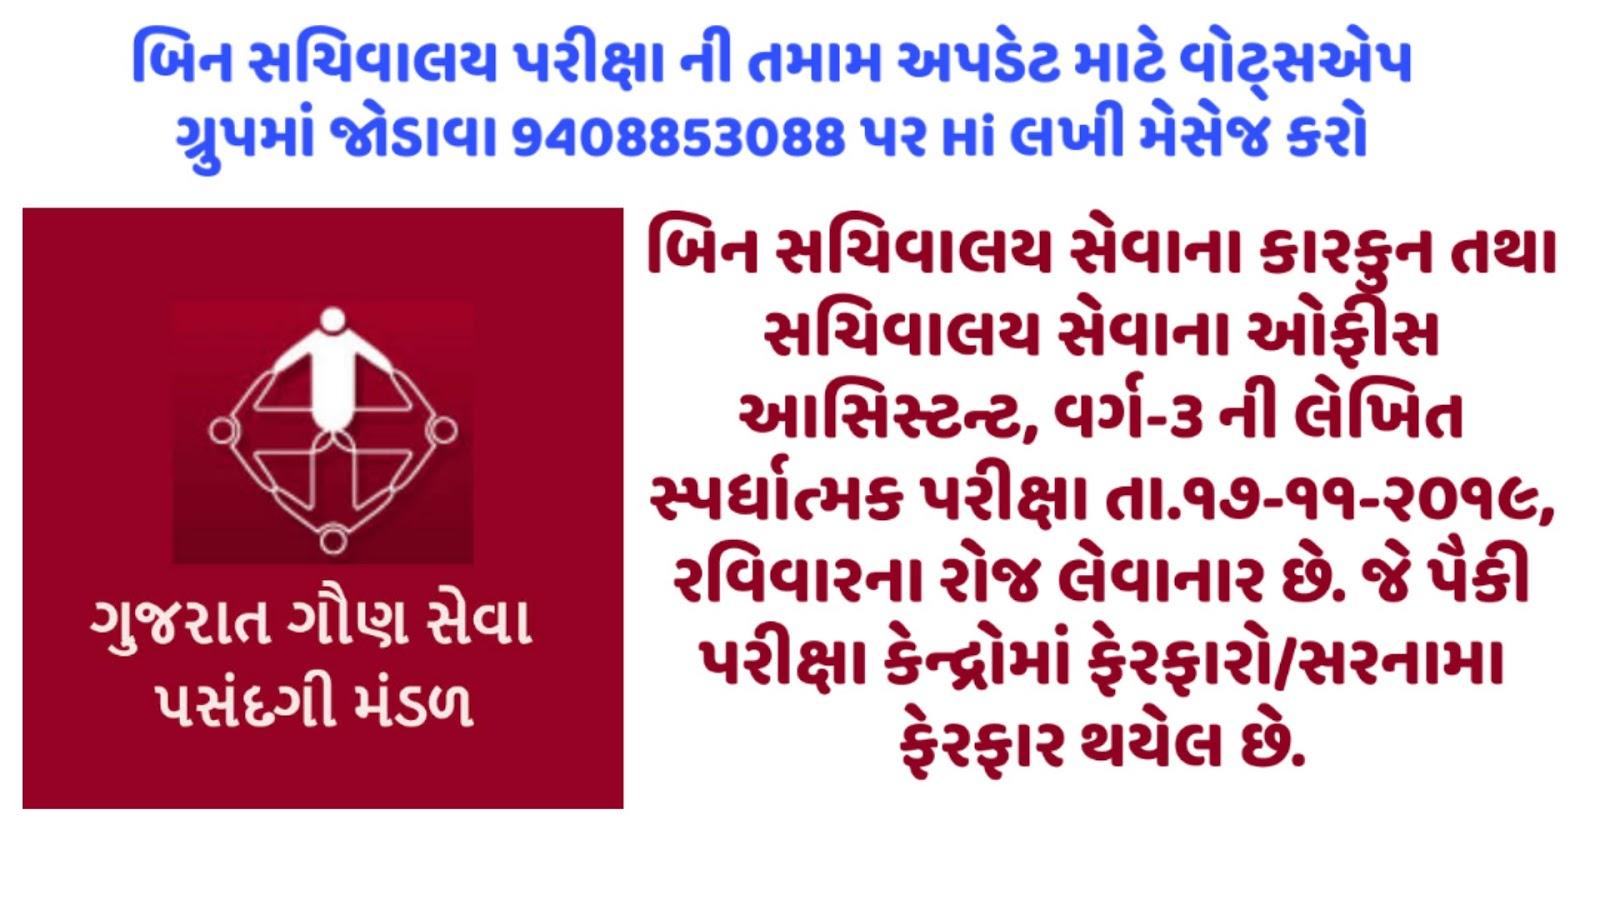 GSSSB Bin Sachivalay Clerk & Office Assistant Exam Center Change Notification 2019